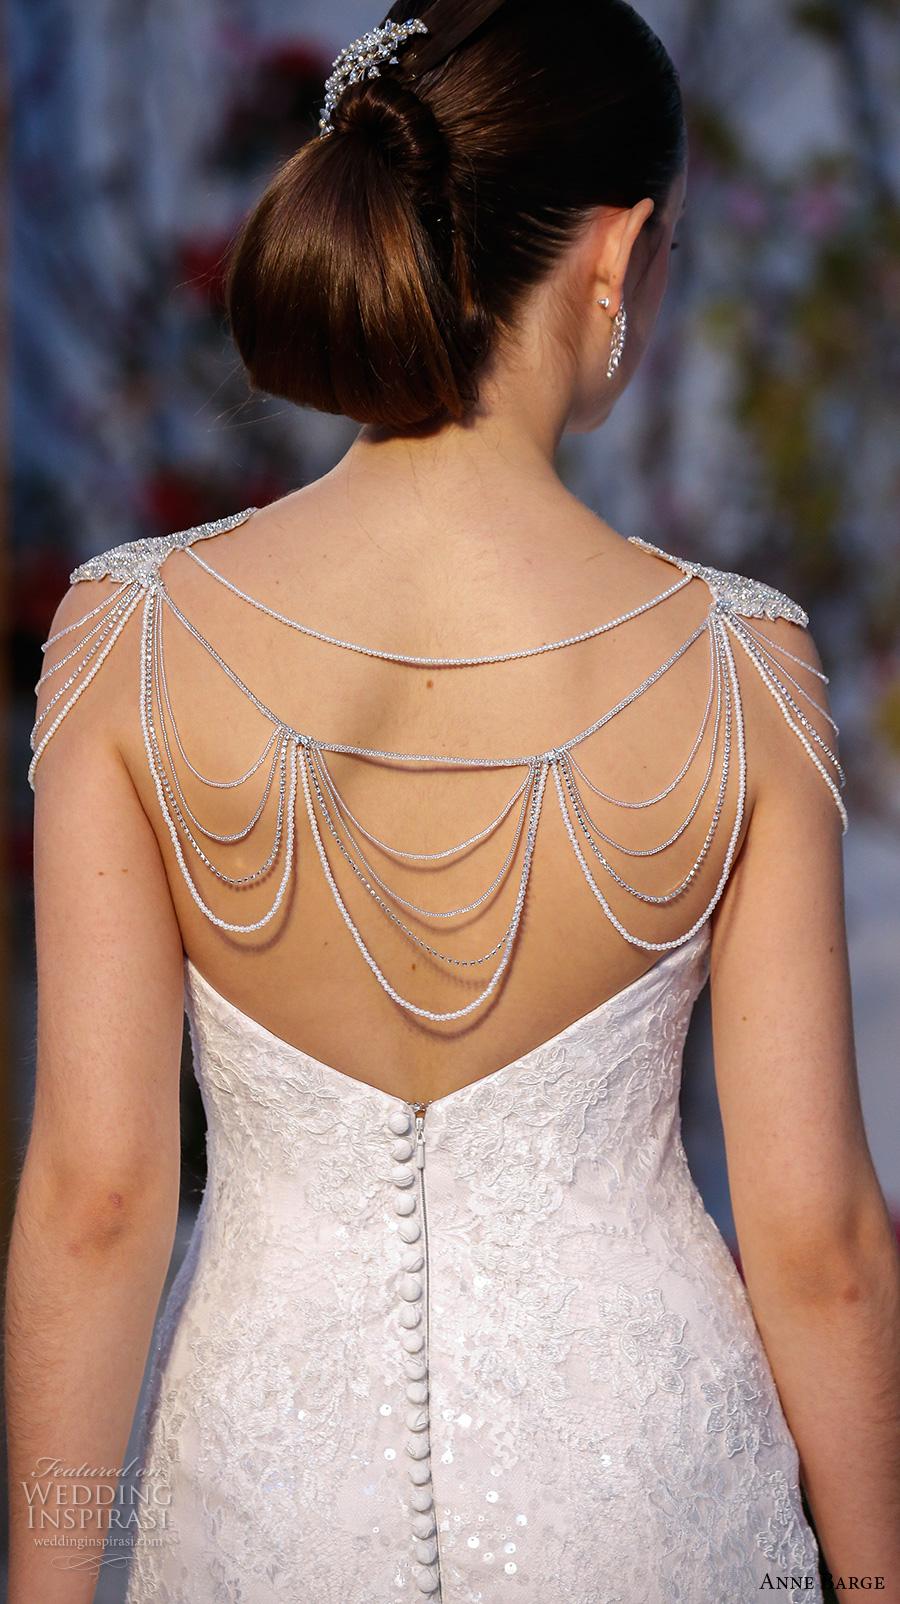 Anne barge spring 2017 wedding dresses wedding inspirasi for Strapless wedding dresses 2017